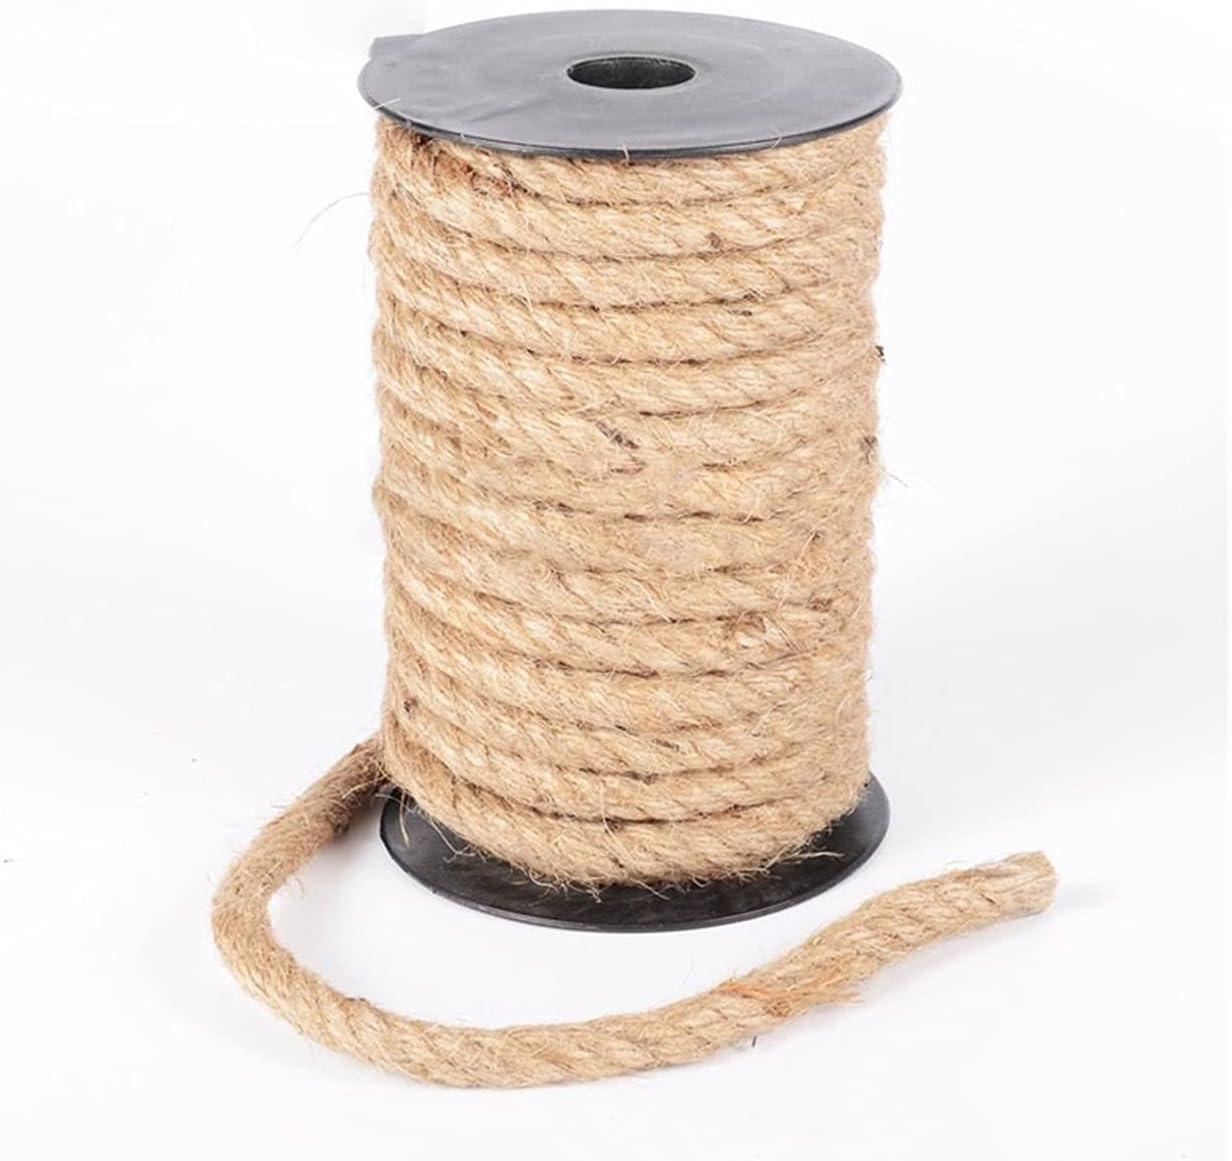 YNX MLKCL 10mm 1m-100m Jute Twine Wedding Craft List price Handmade DIY 2021 spring and summer new Hom